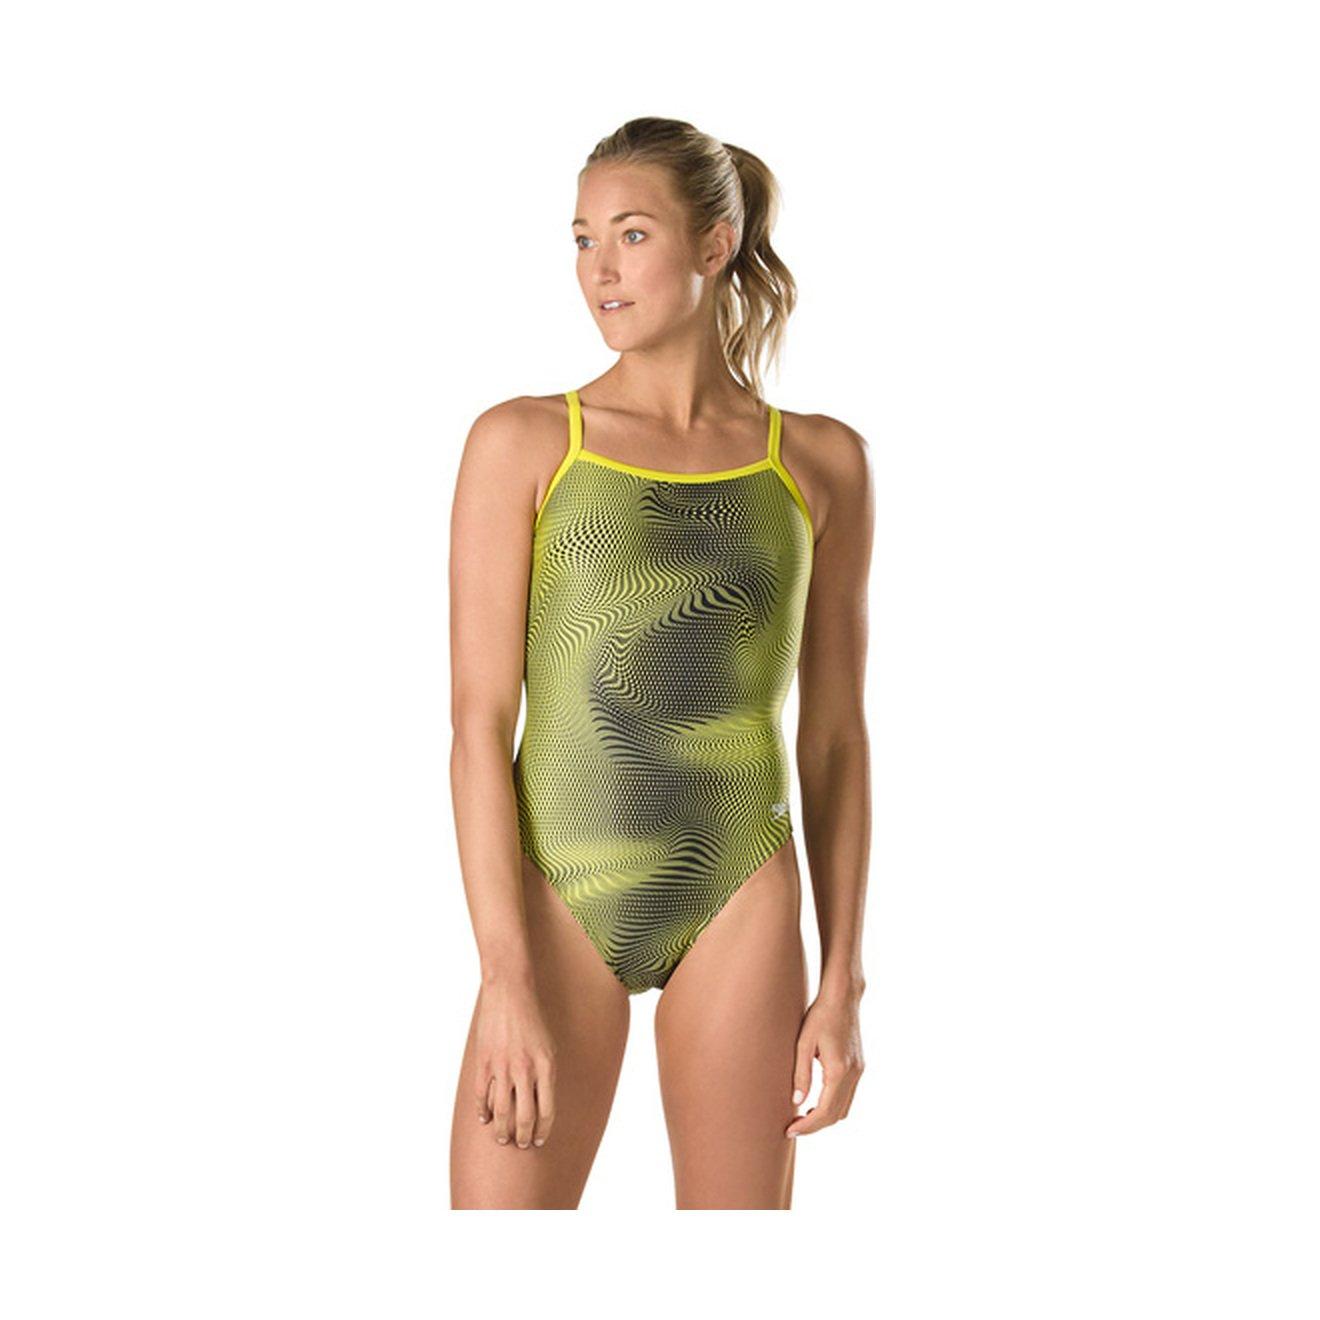 Speedo Women's Hydro Amp Fly back Power flex Eco One Piece Swimsuit, 34, Yellow